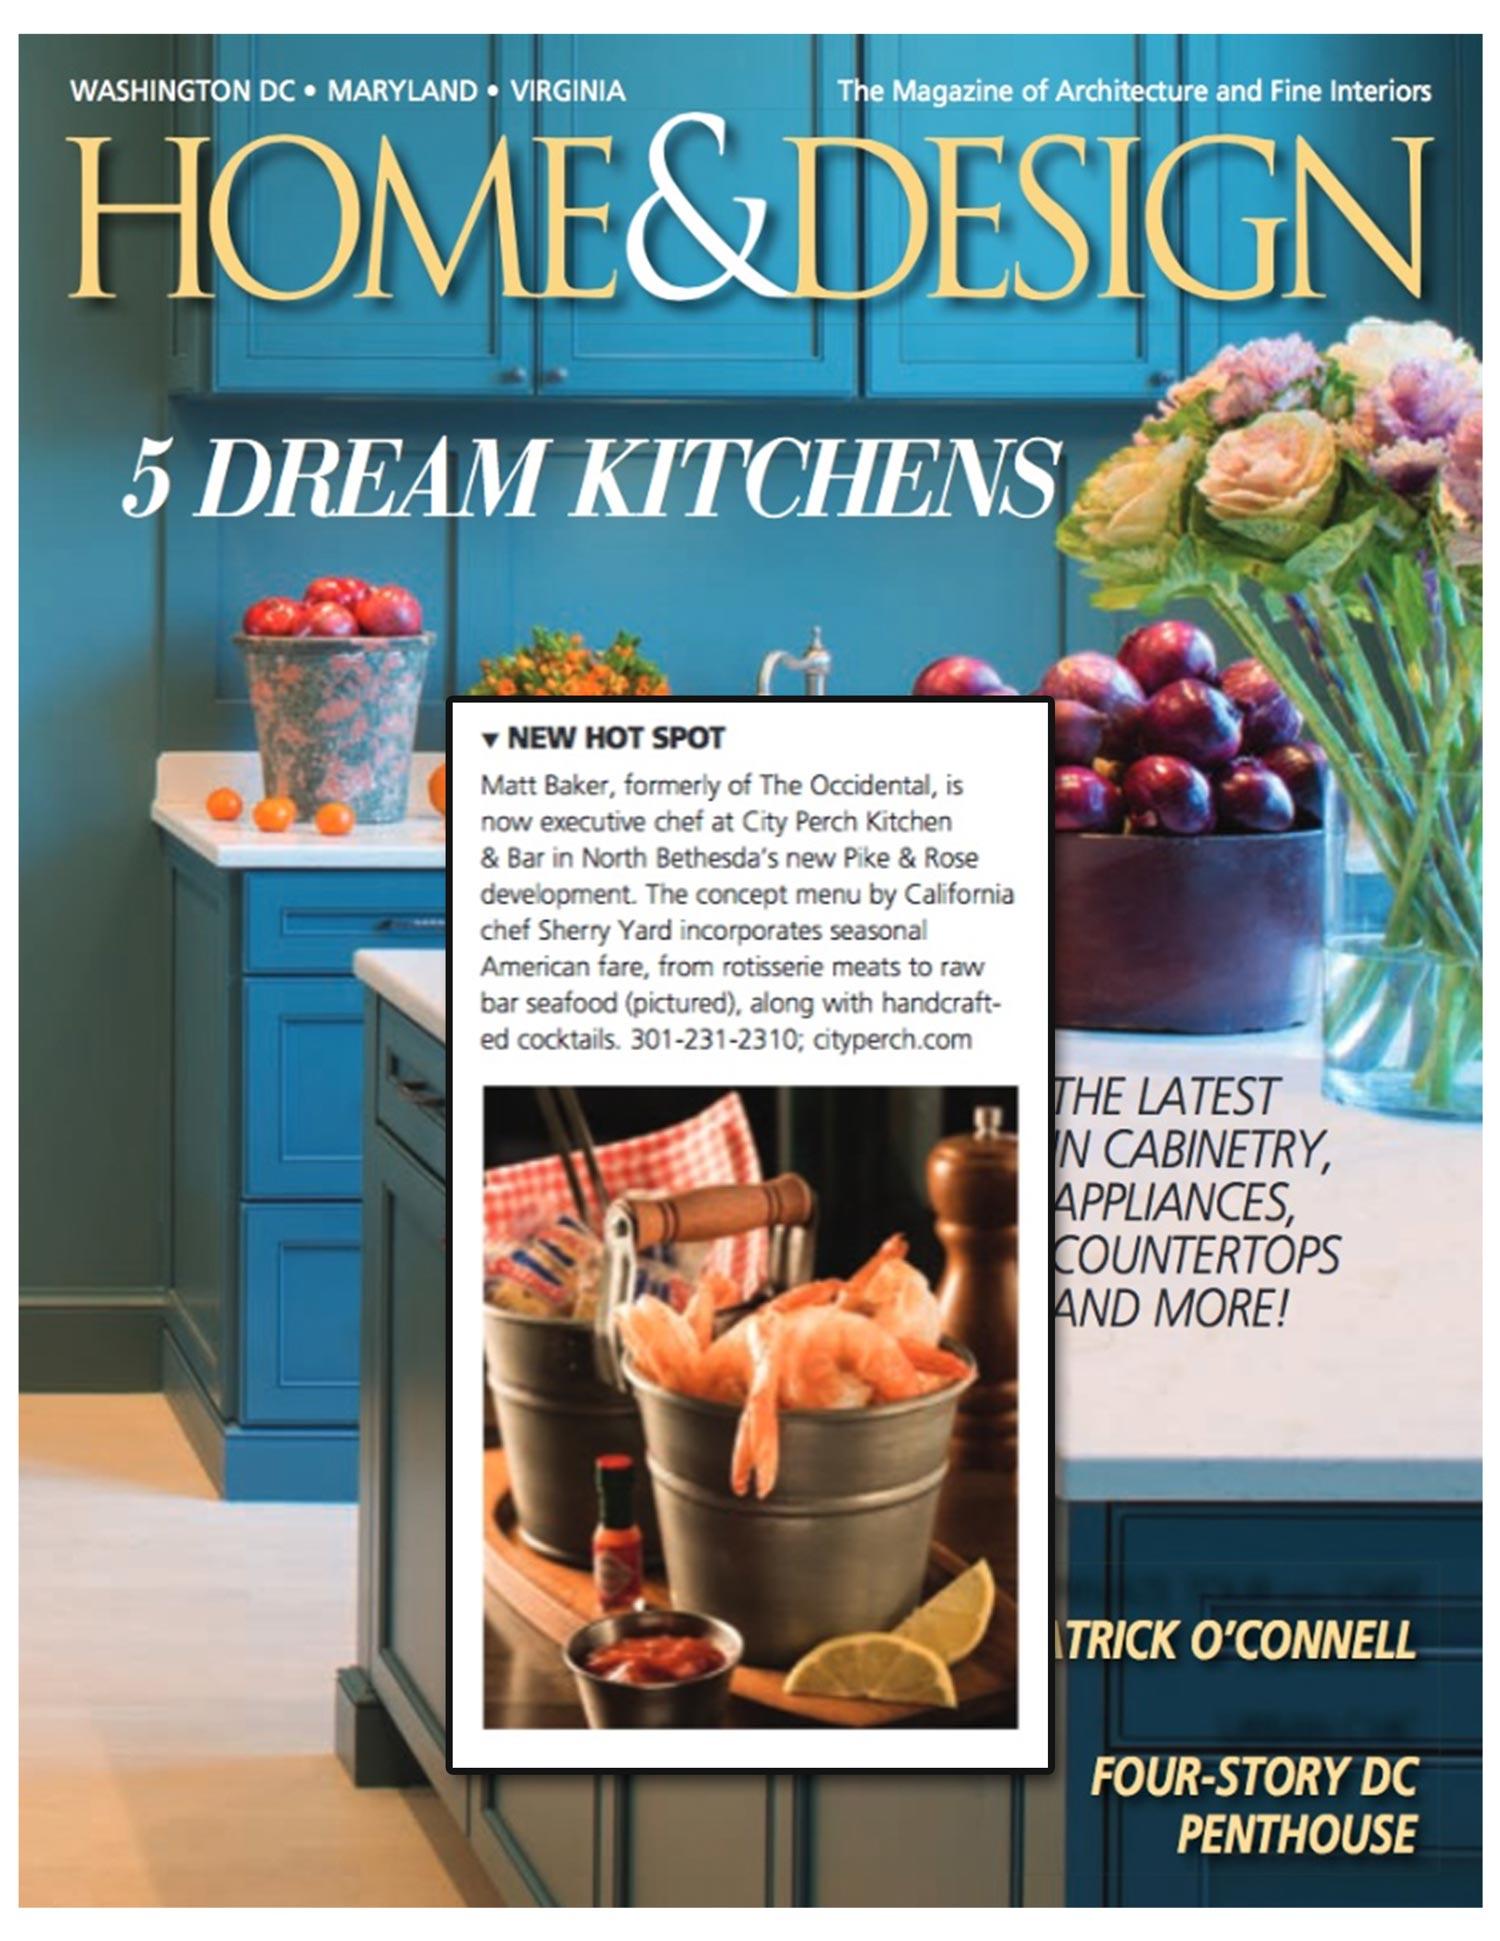 IPIC_CITYPERCH_Press_Home&Design_010115.jpg